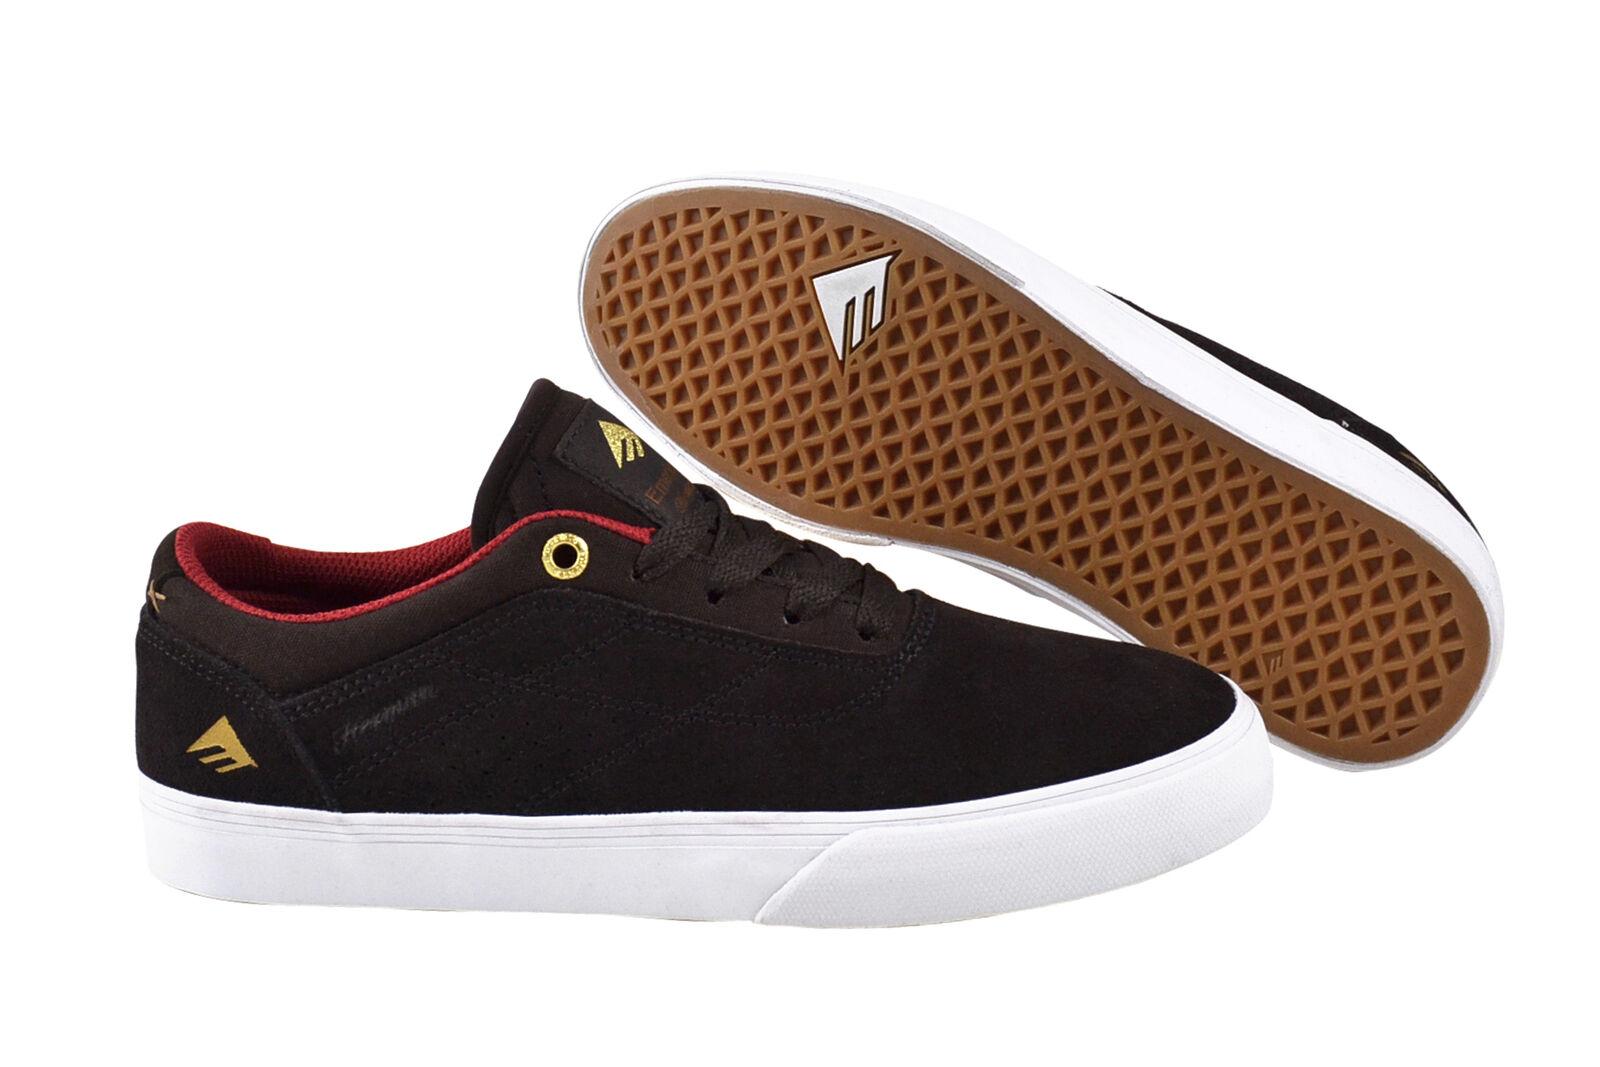 Emerica The Herman G6 Vulc brown white Sneaker Schuhe braun